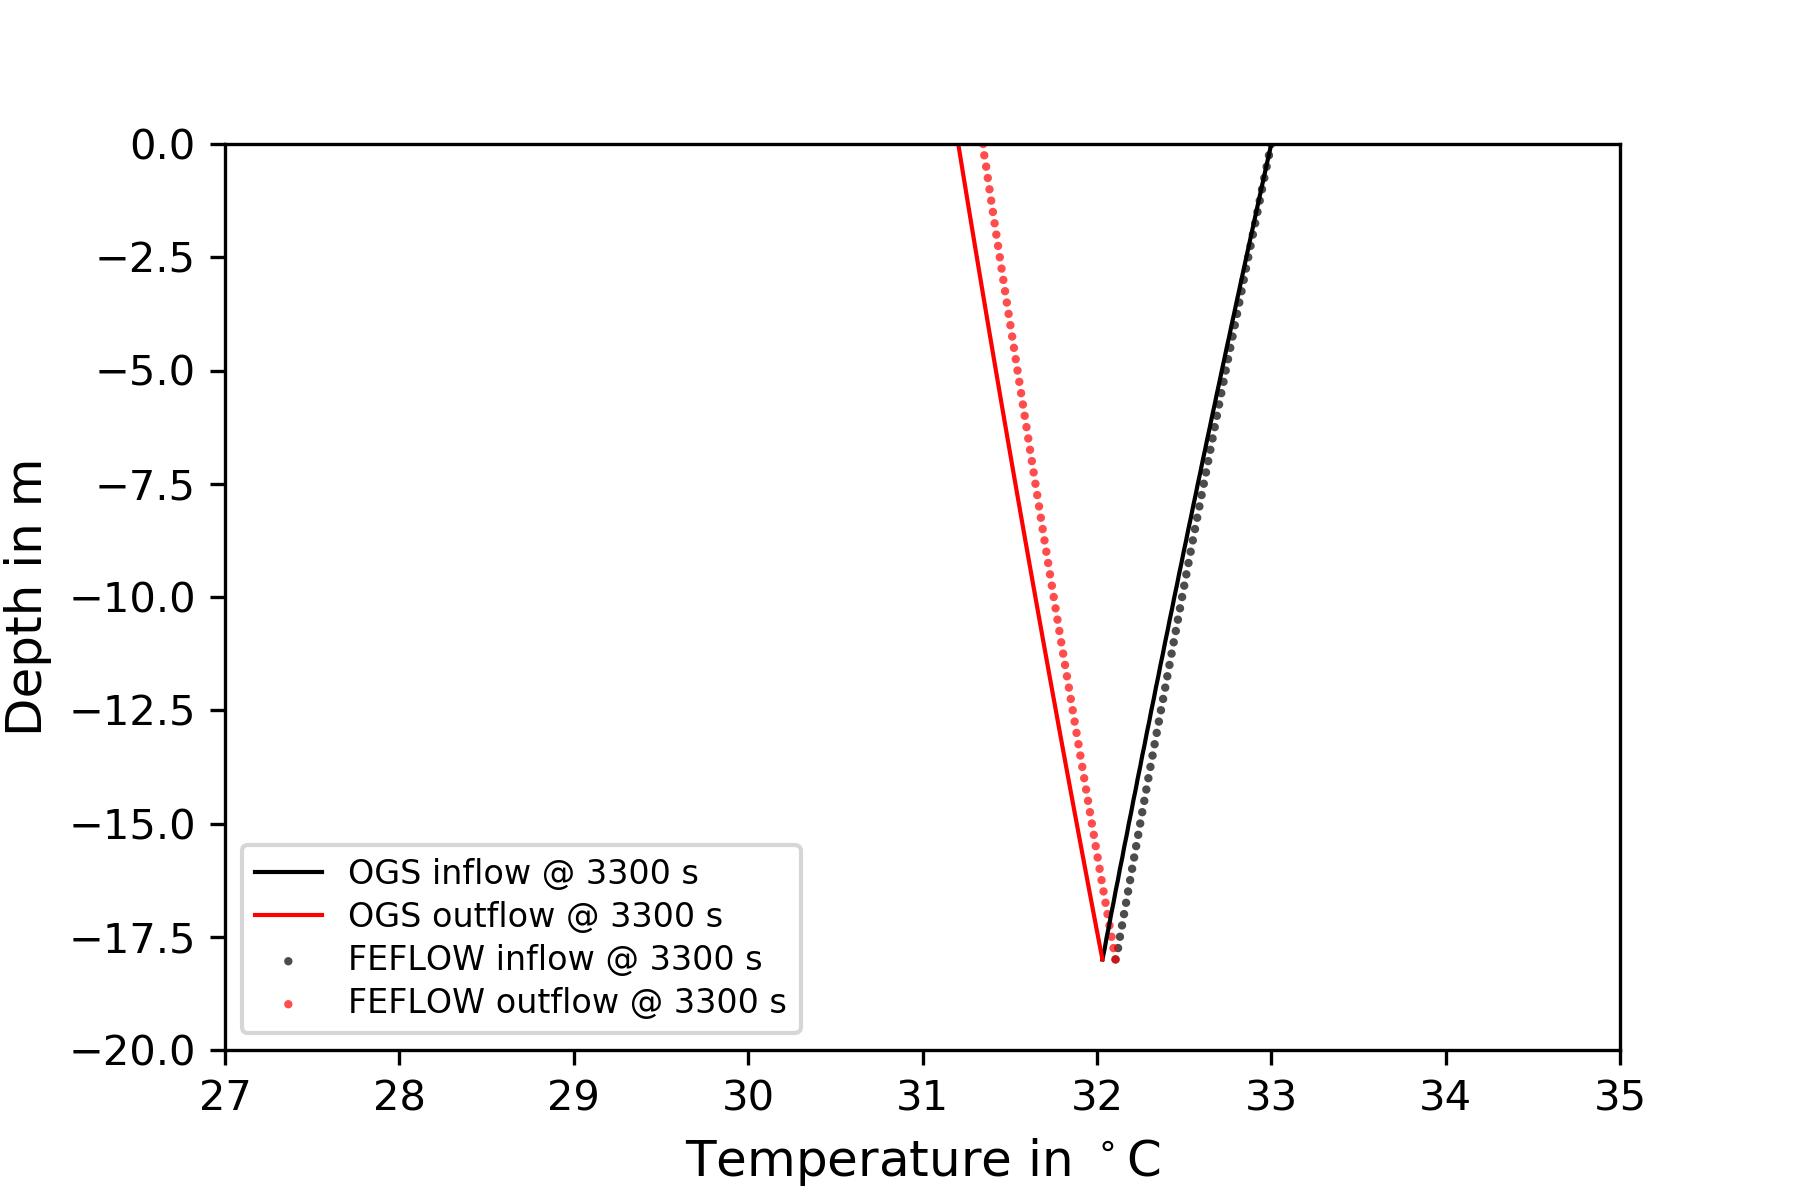 web/content/docs/benchmarks/heat-transport-bhe/3D_2U_BHE_figures/vertical_temperature_distribution.png